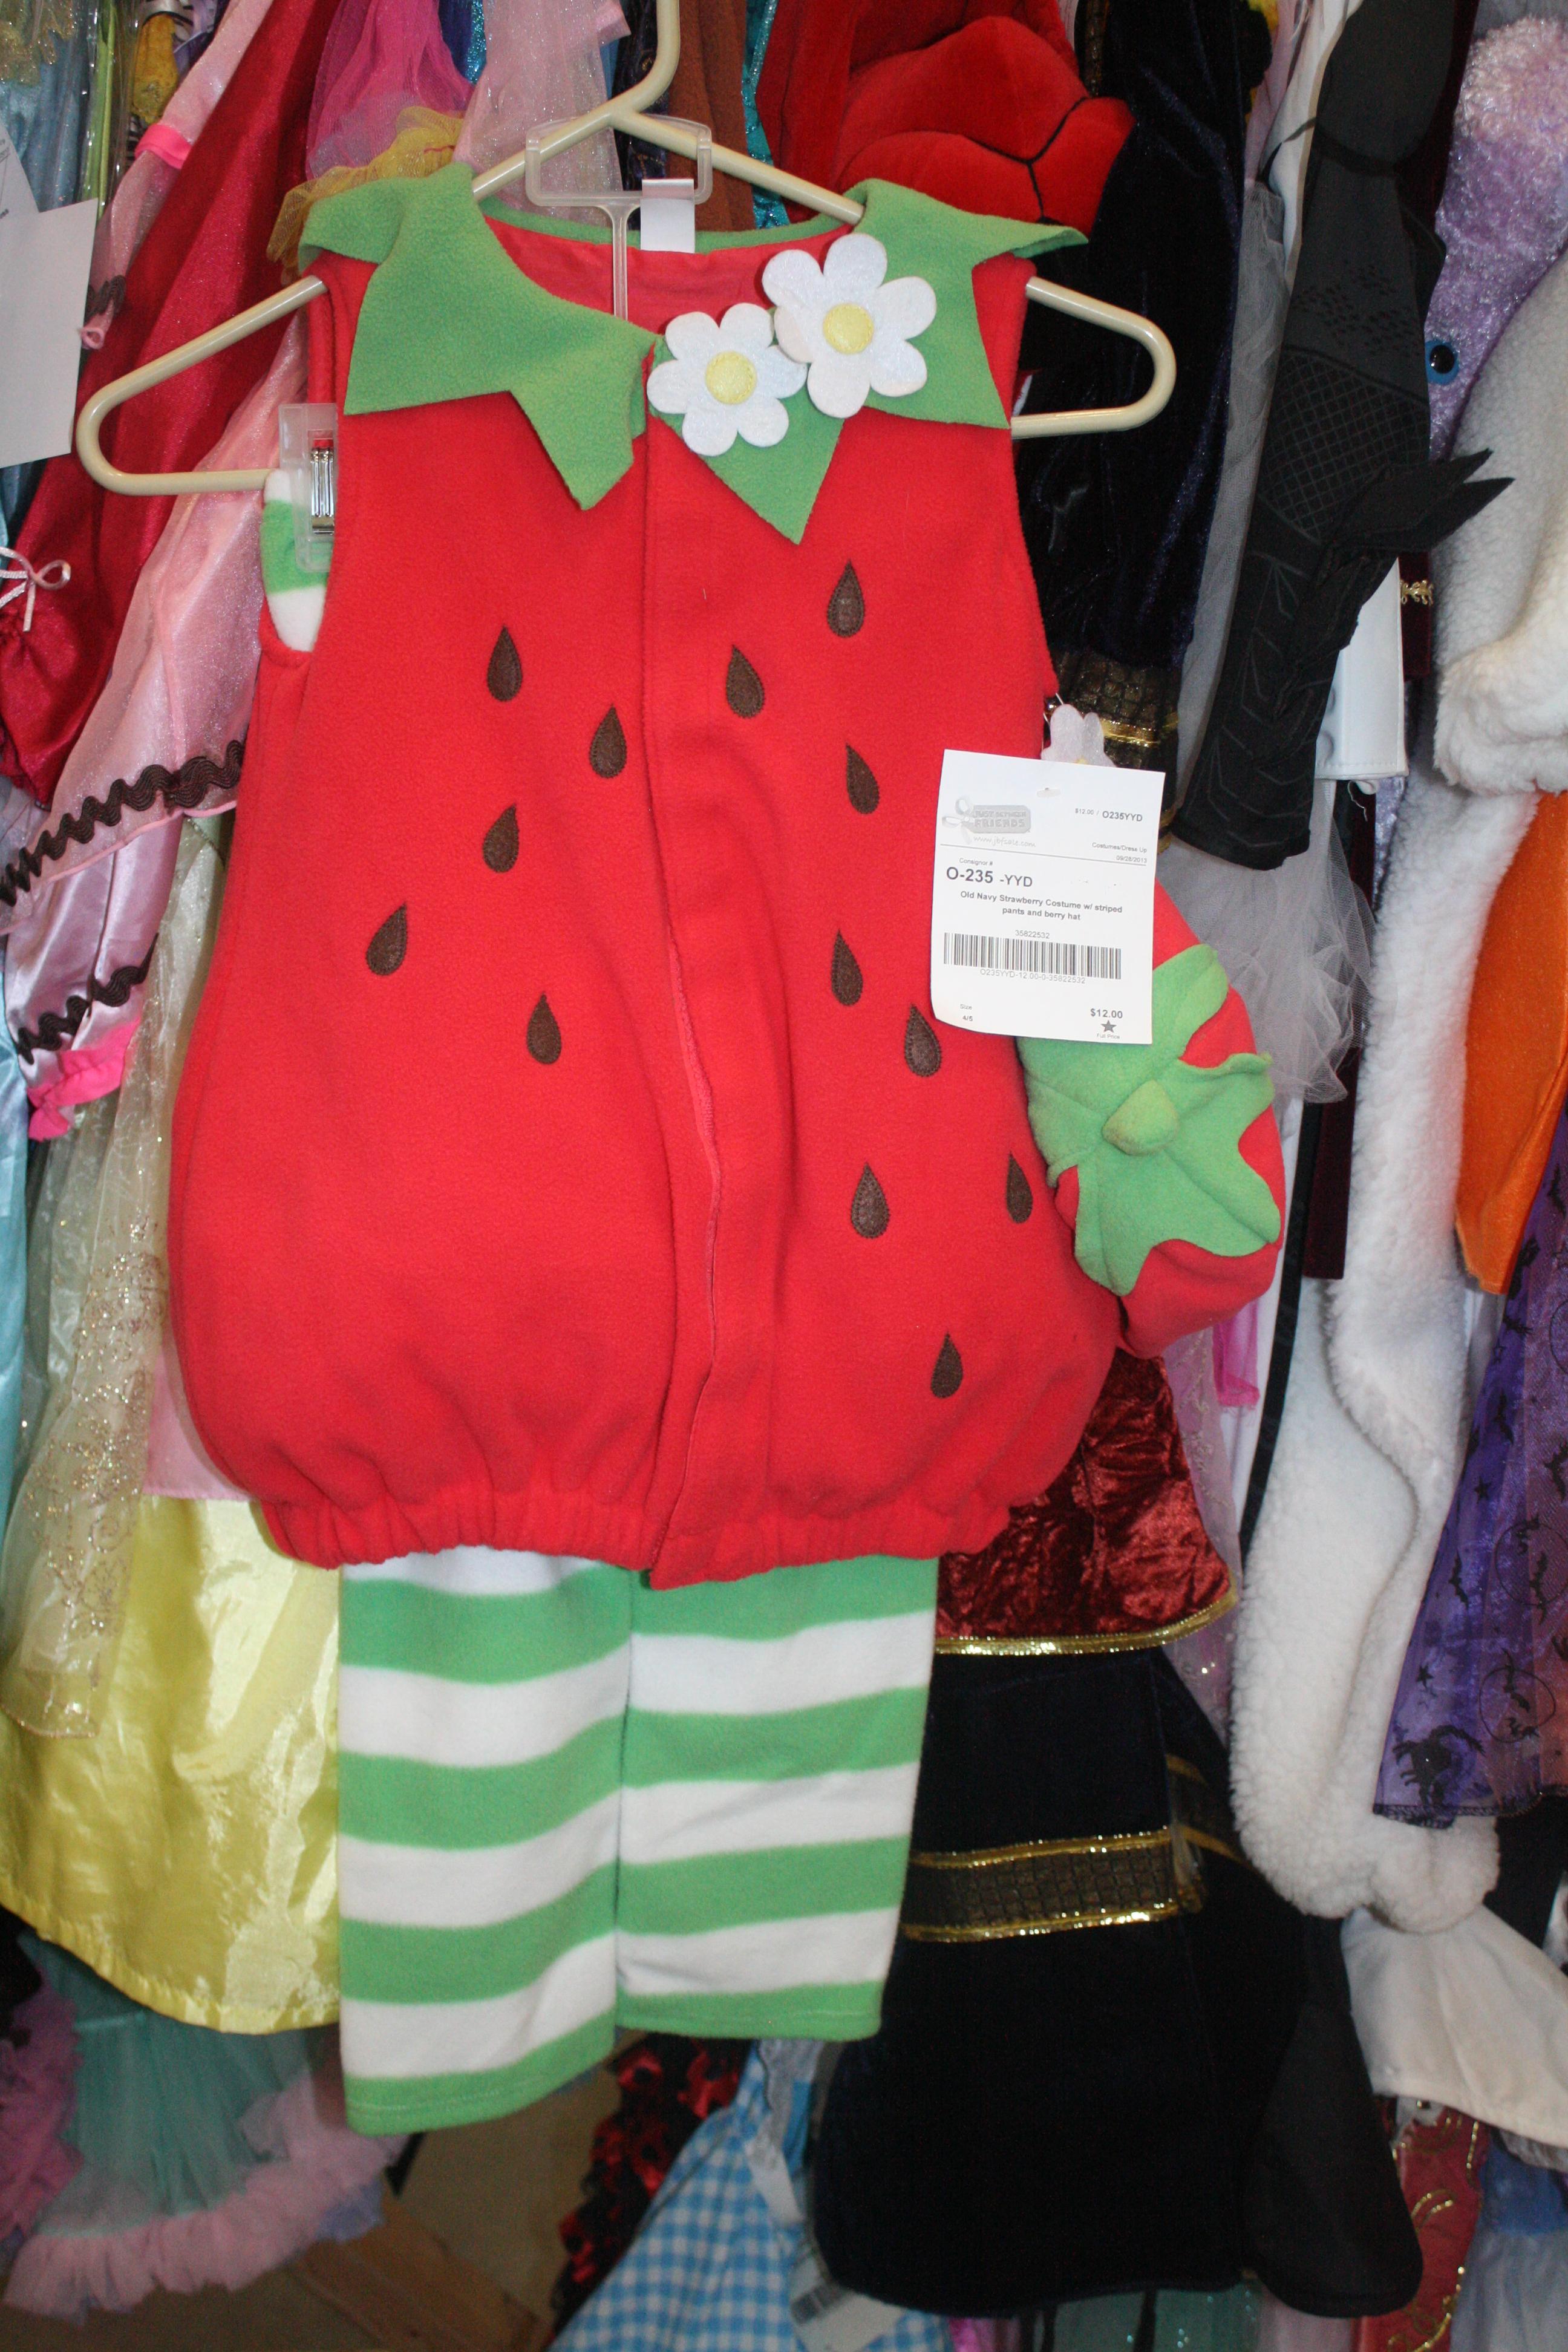 jbf costumes